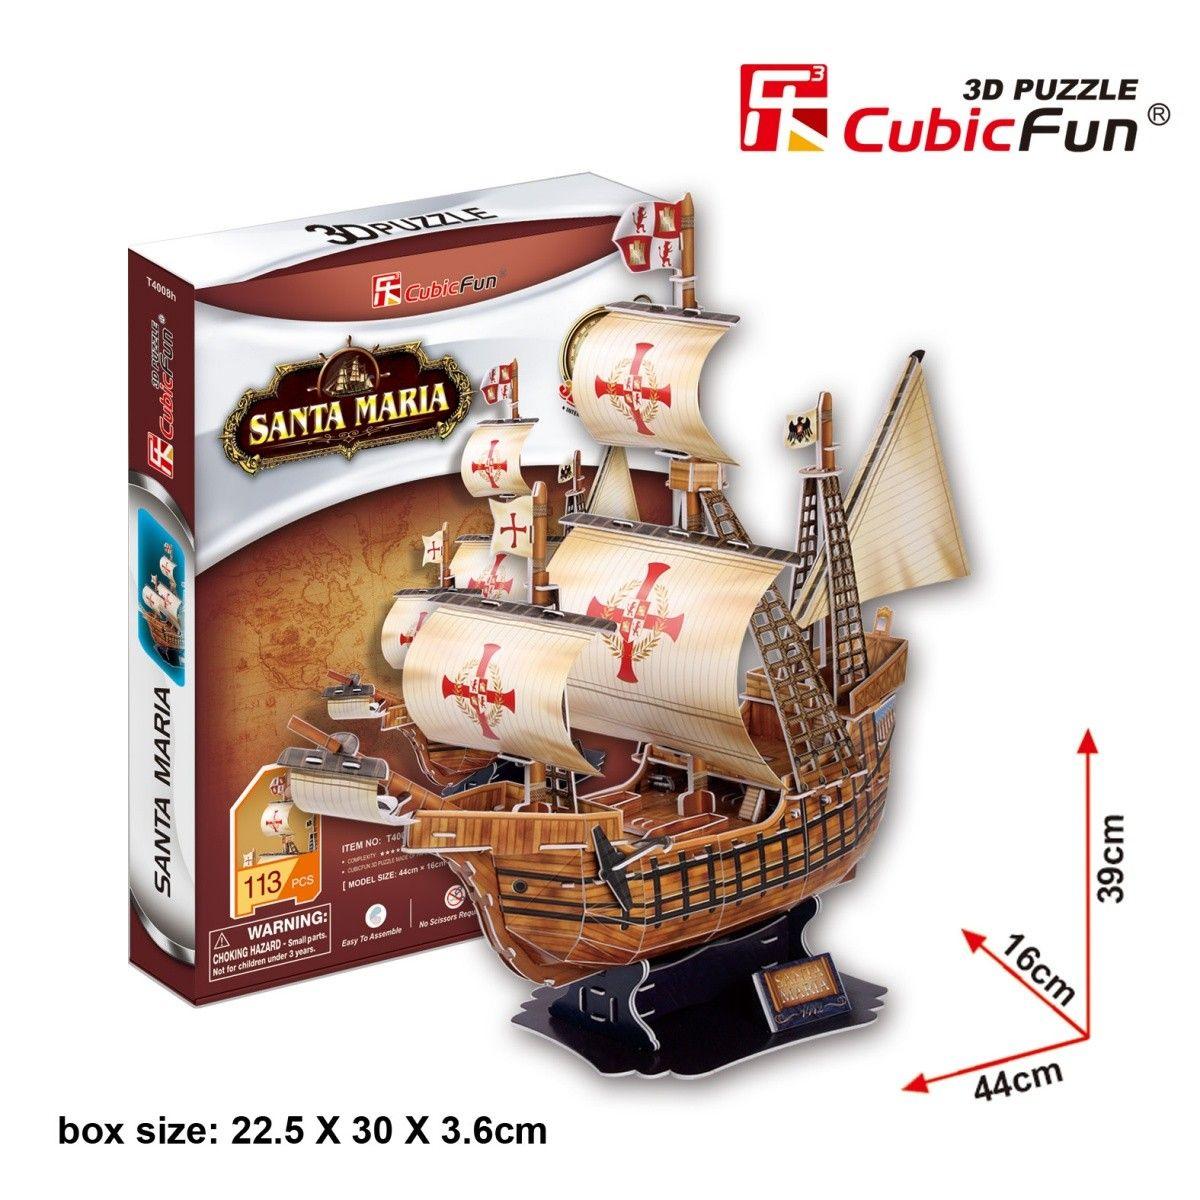 CubicFun 3D puzzle - plachetnice Santa Maria 113 dílků 24008 Cubic Fun